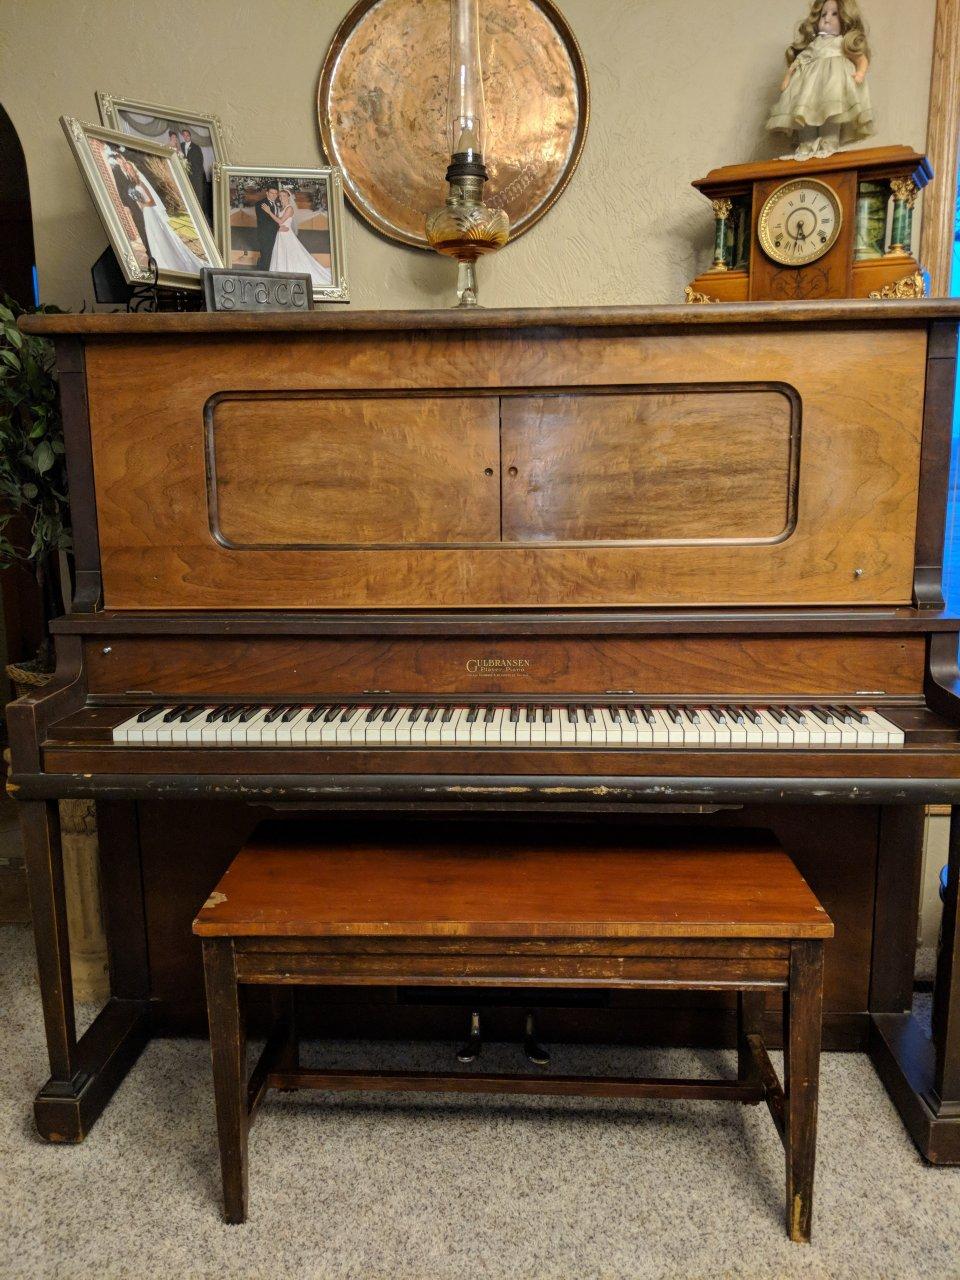 gulbransen piano dating halo effekt online dating